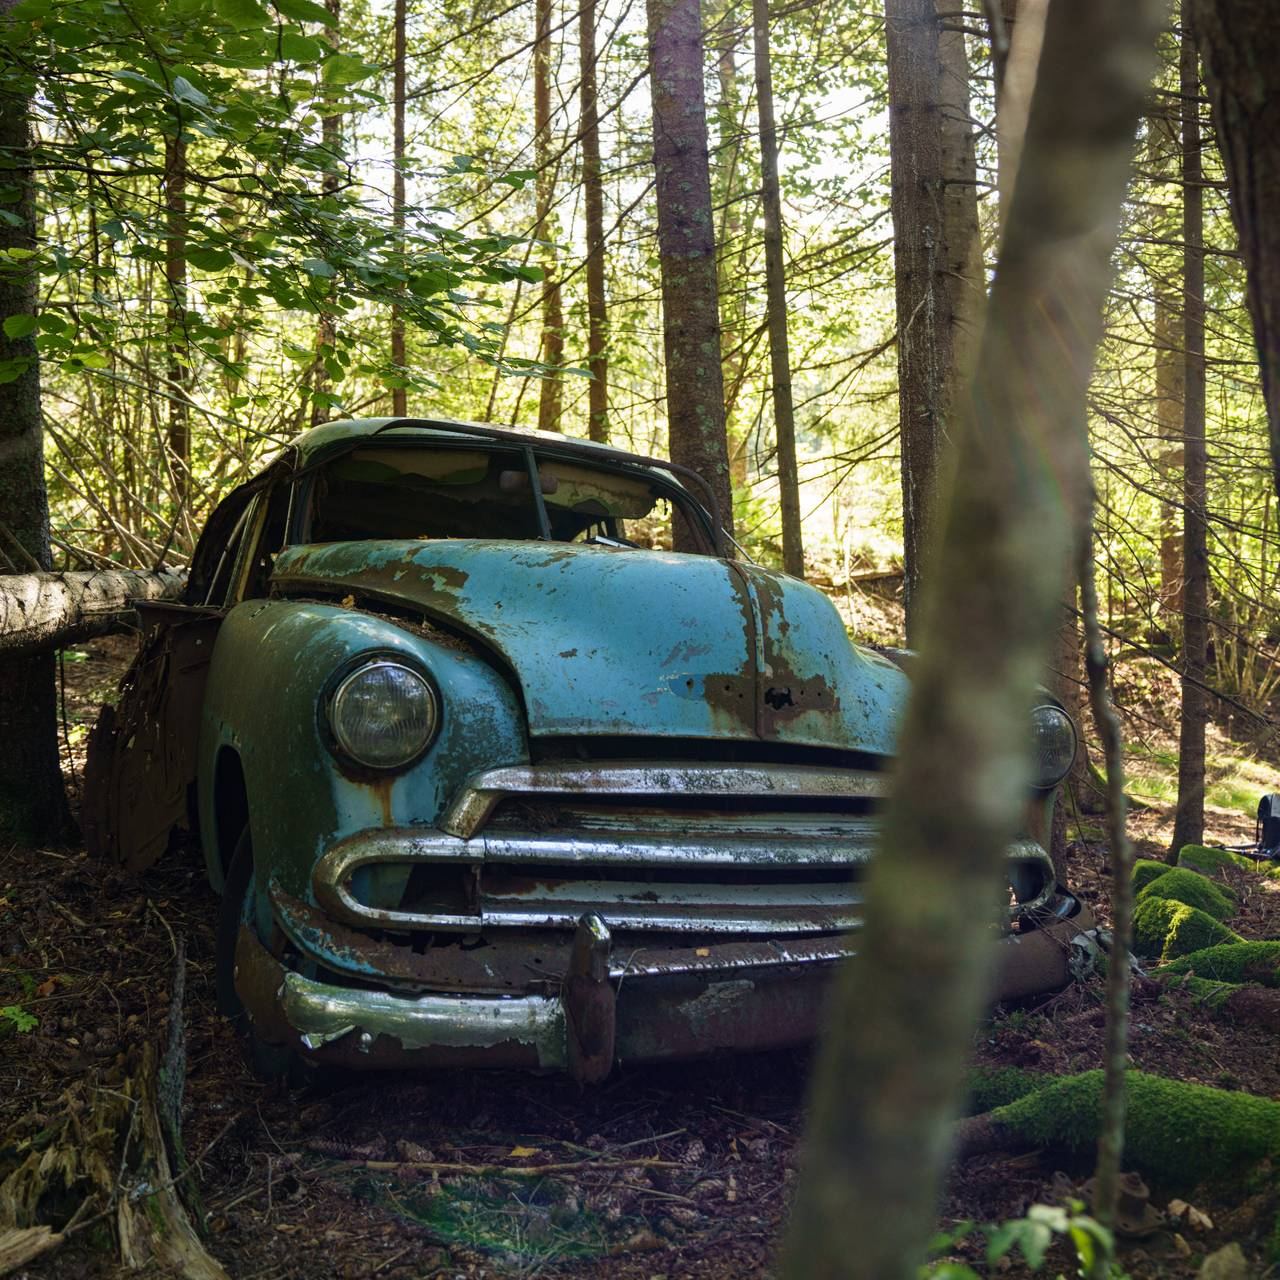 Vrak i skogen